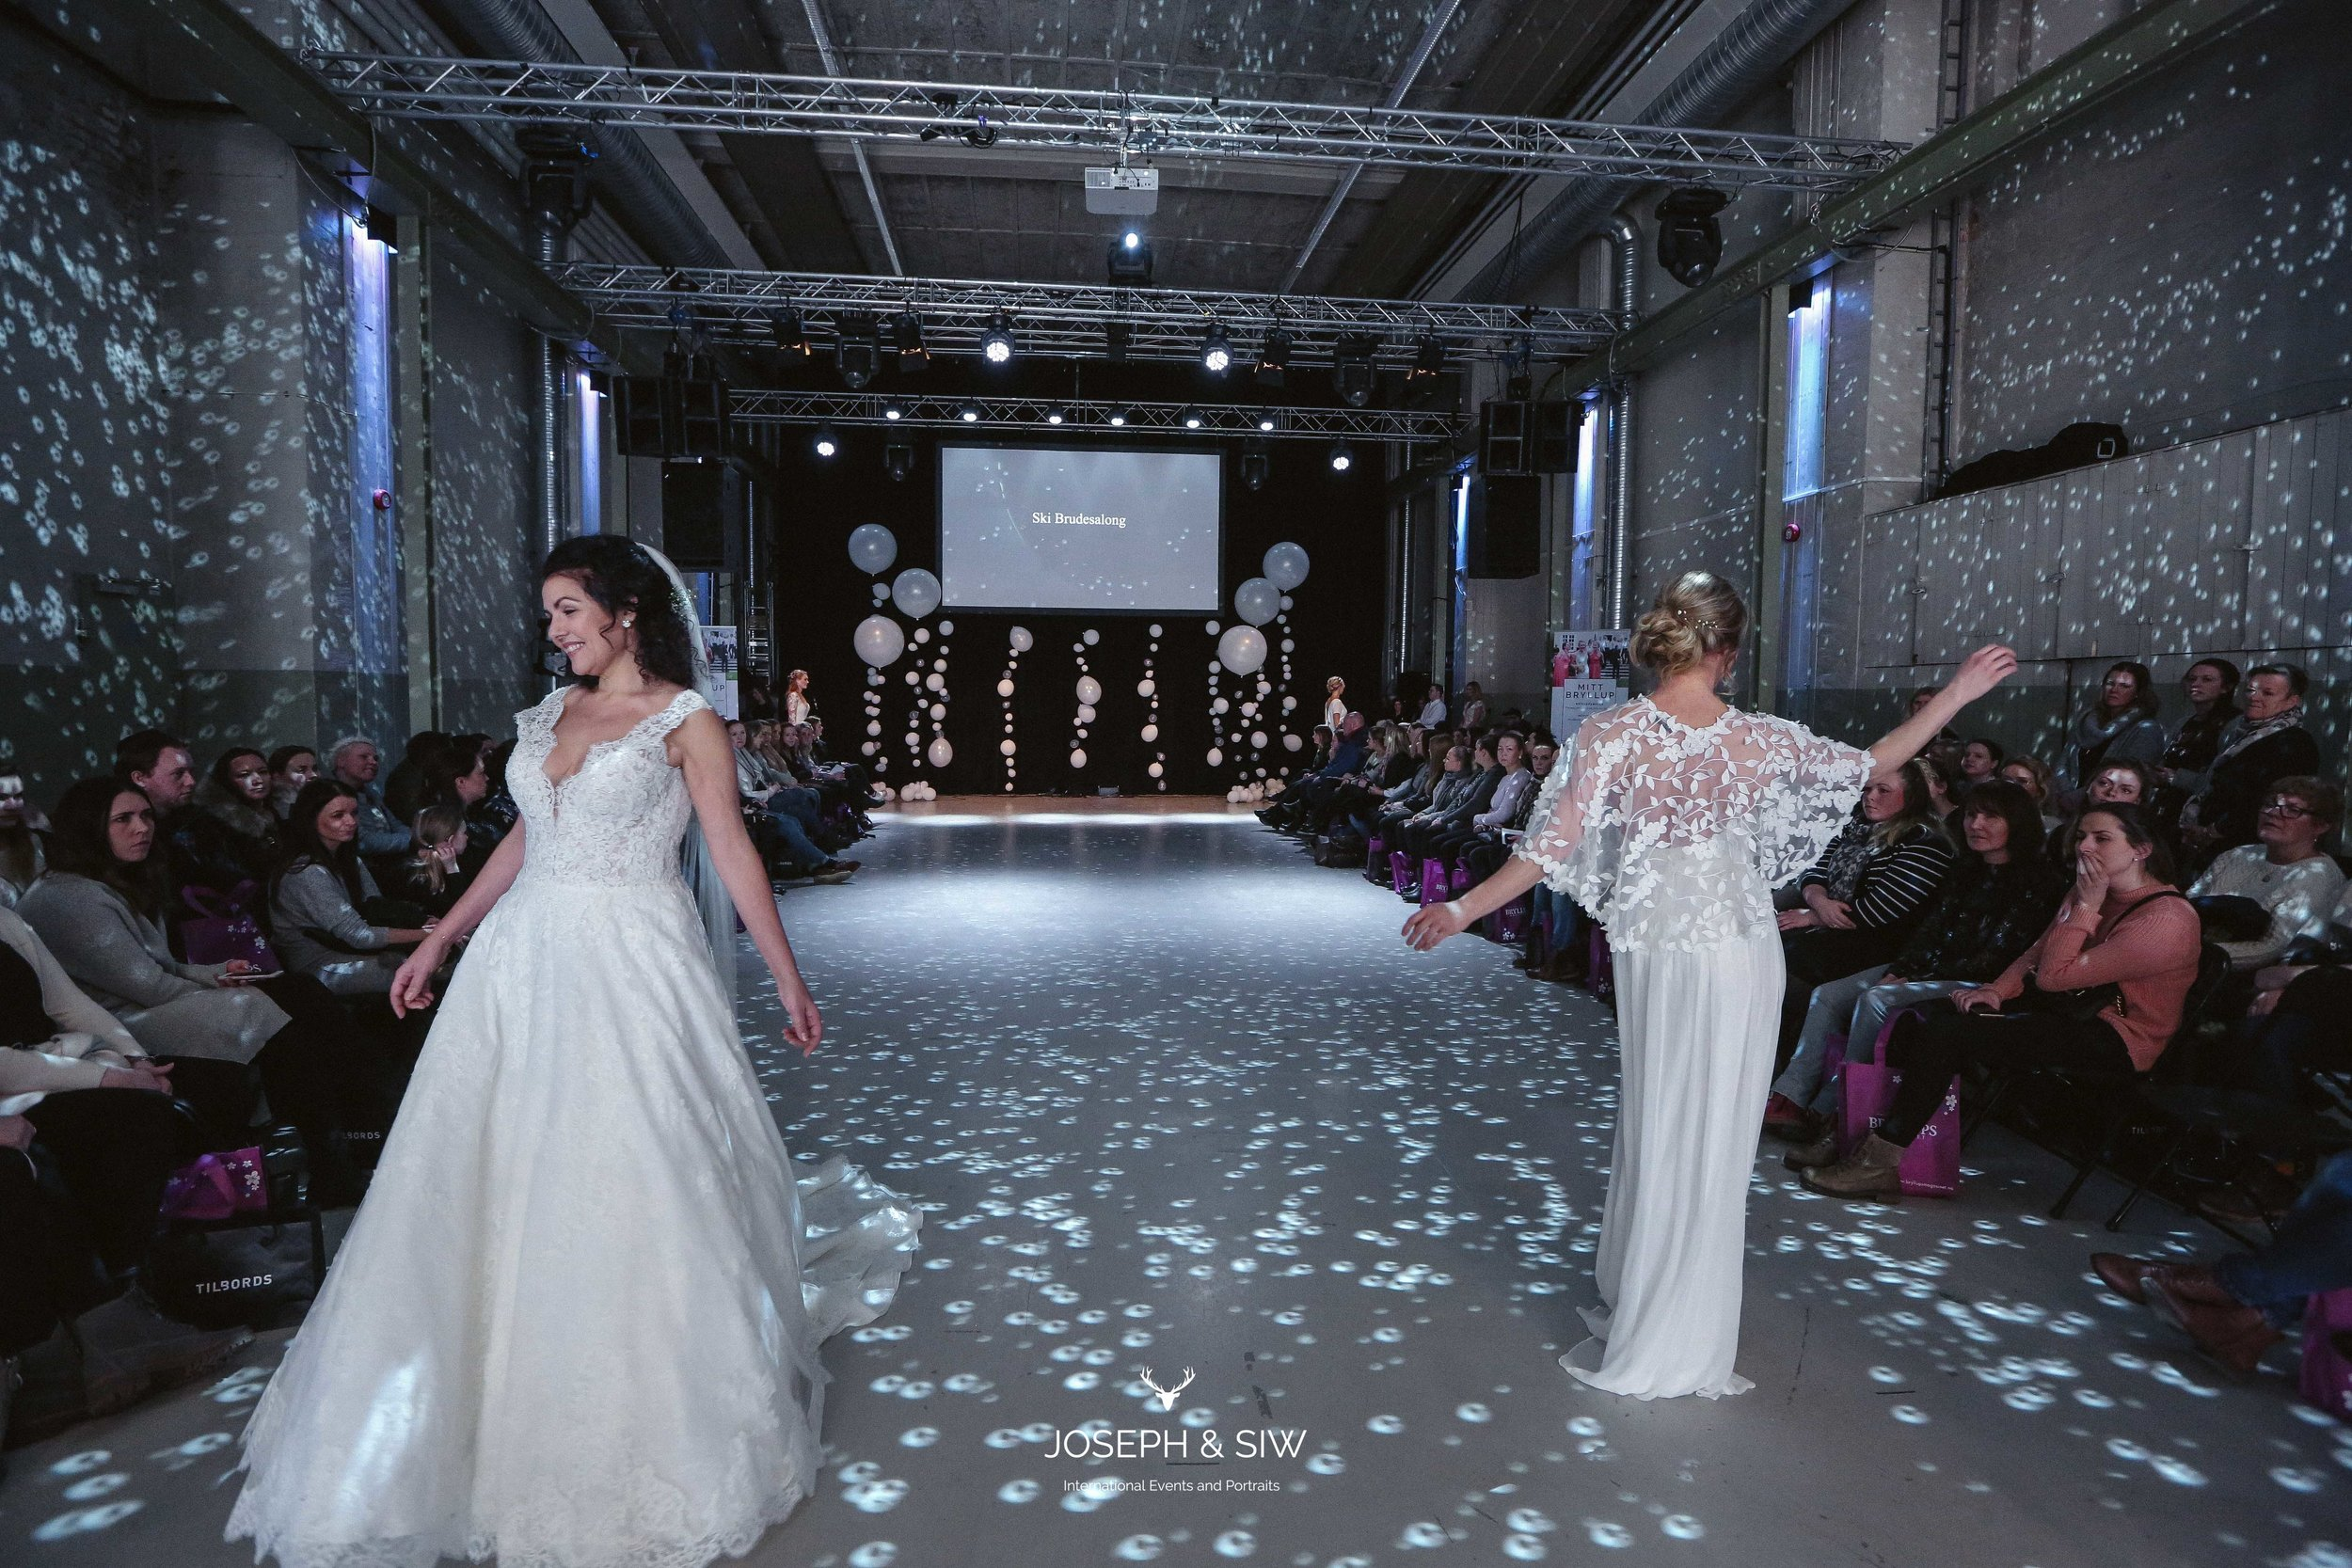 mittbryllup_bryllupsmesse_i_oslo_145.jpg